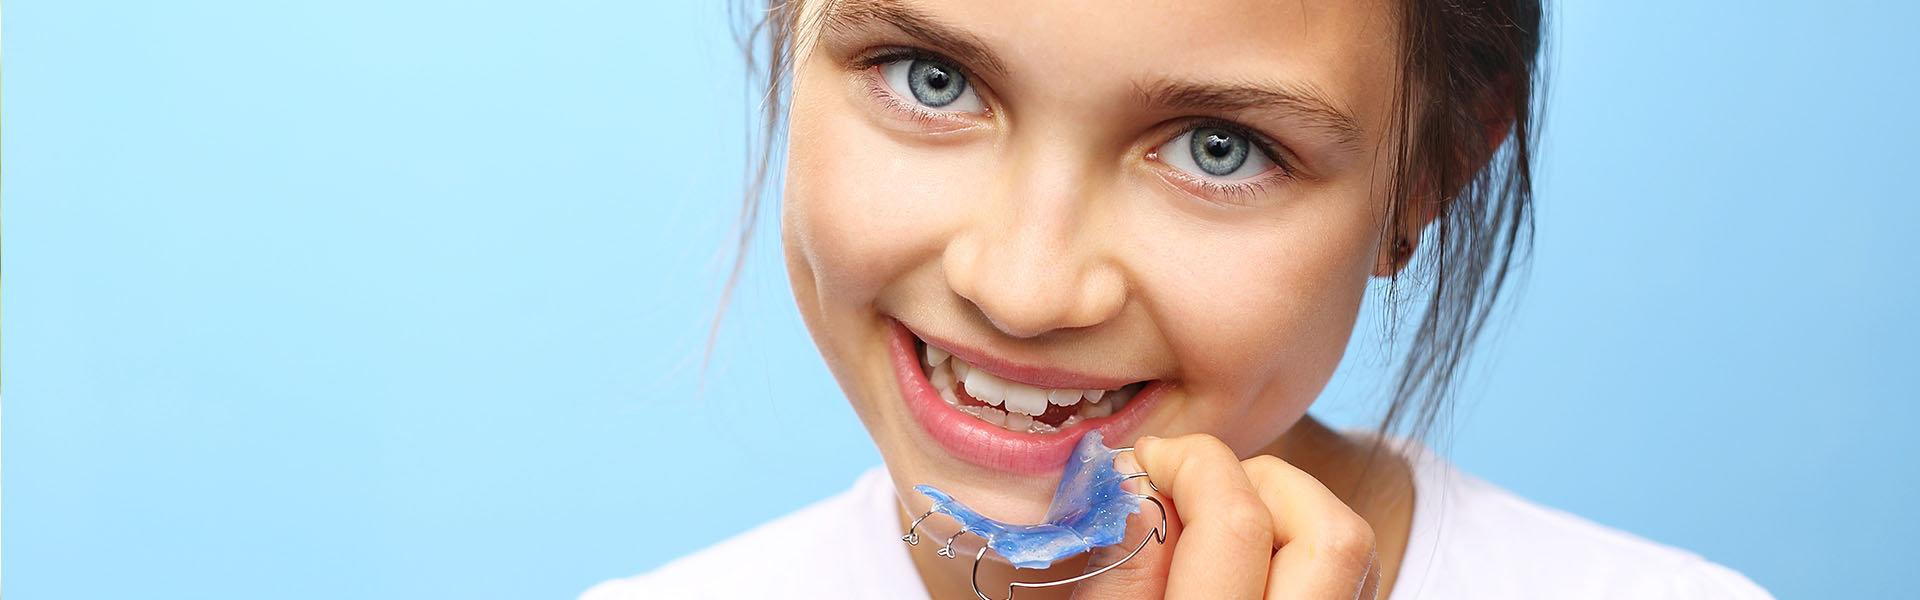 Die Zahnärzte Malters Thomas Marianantoni